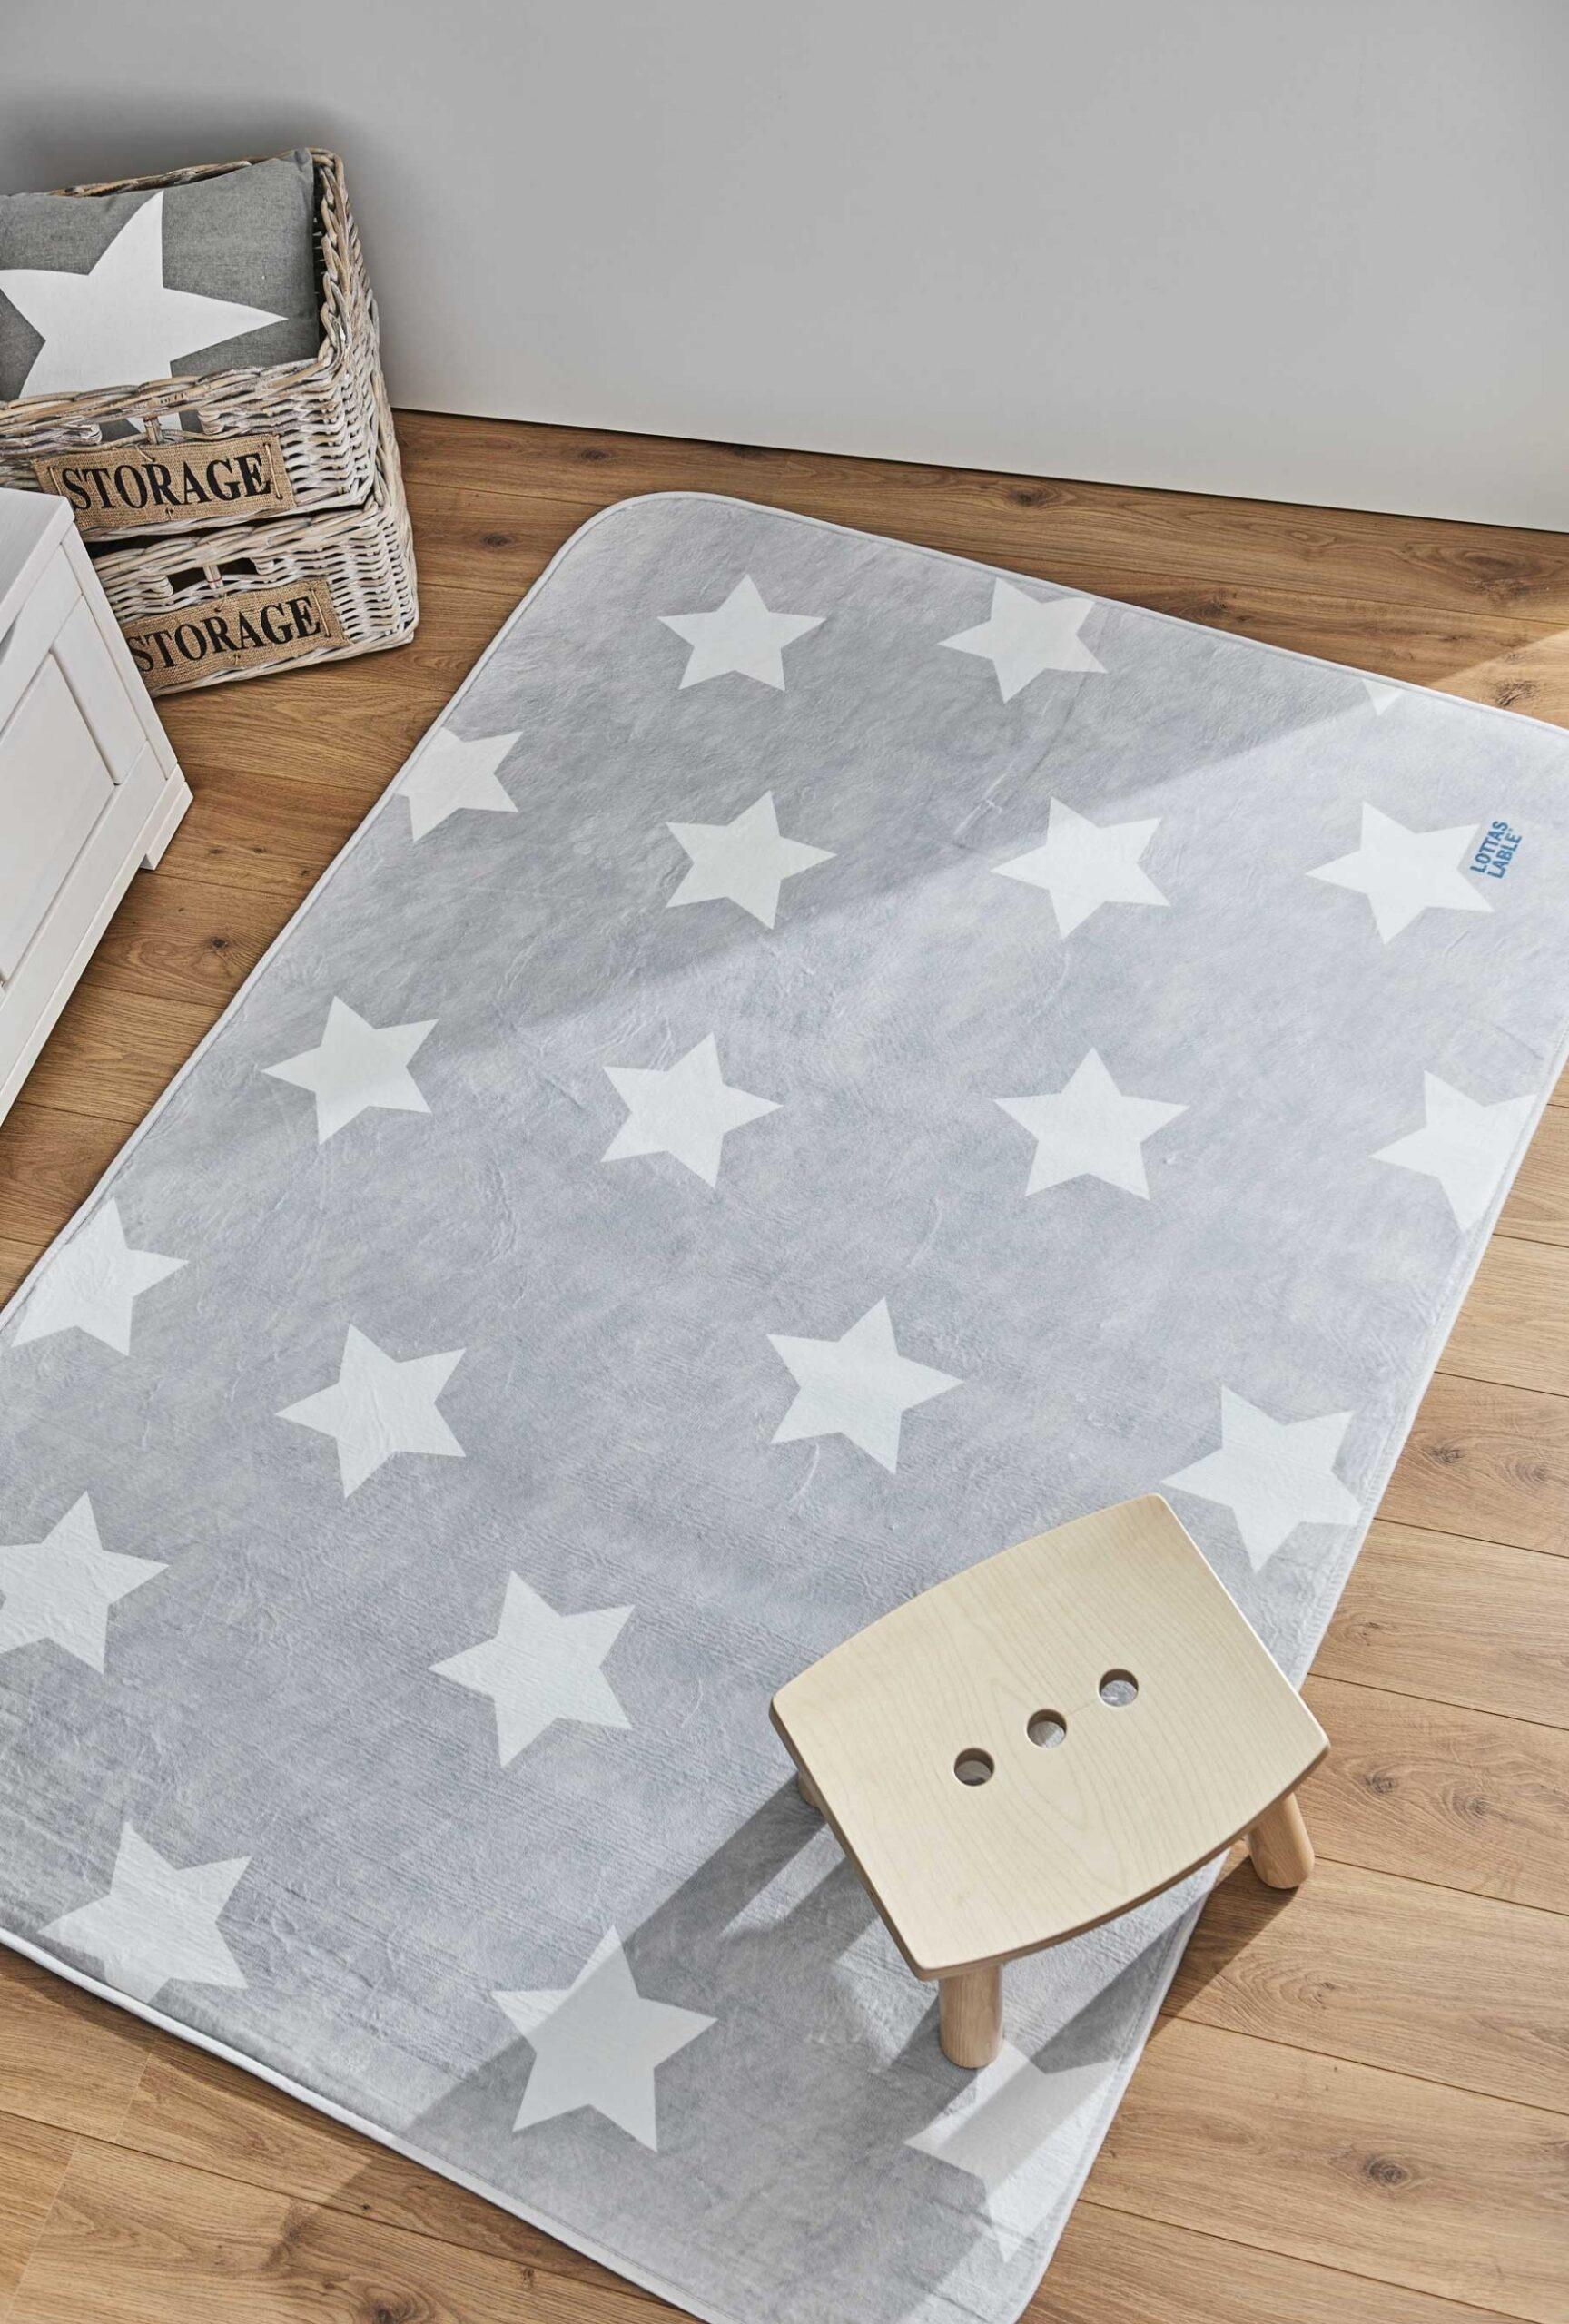 Full Size of Teppichboden Kinderzimmer Vianova Project Regal Weiß Sofa Regale Kinderzimmer Teppichboden Kinderzimmer